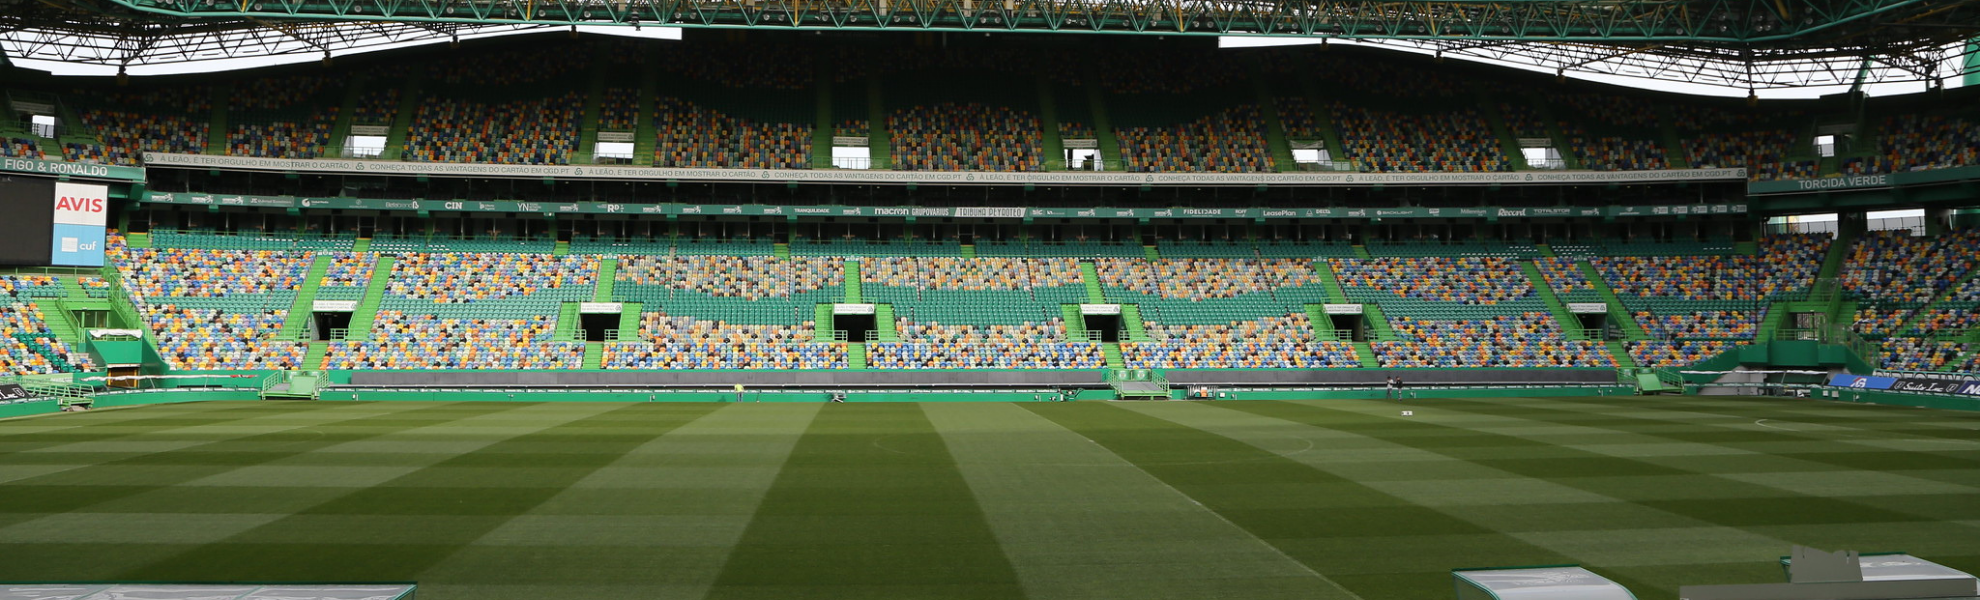 sporting stadium background